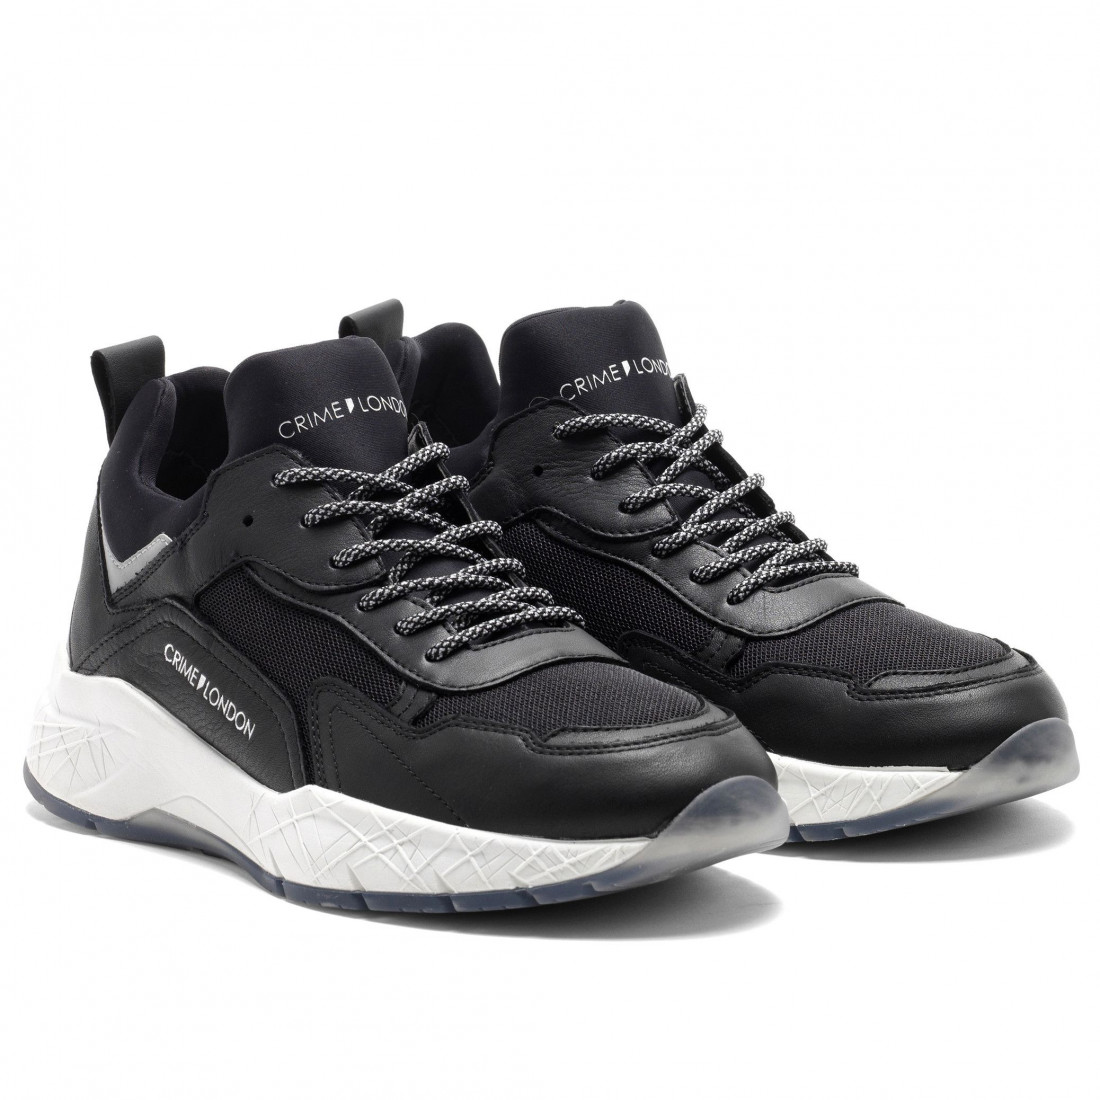 sneakers uomo crime london 1105320 5025